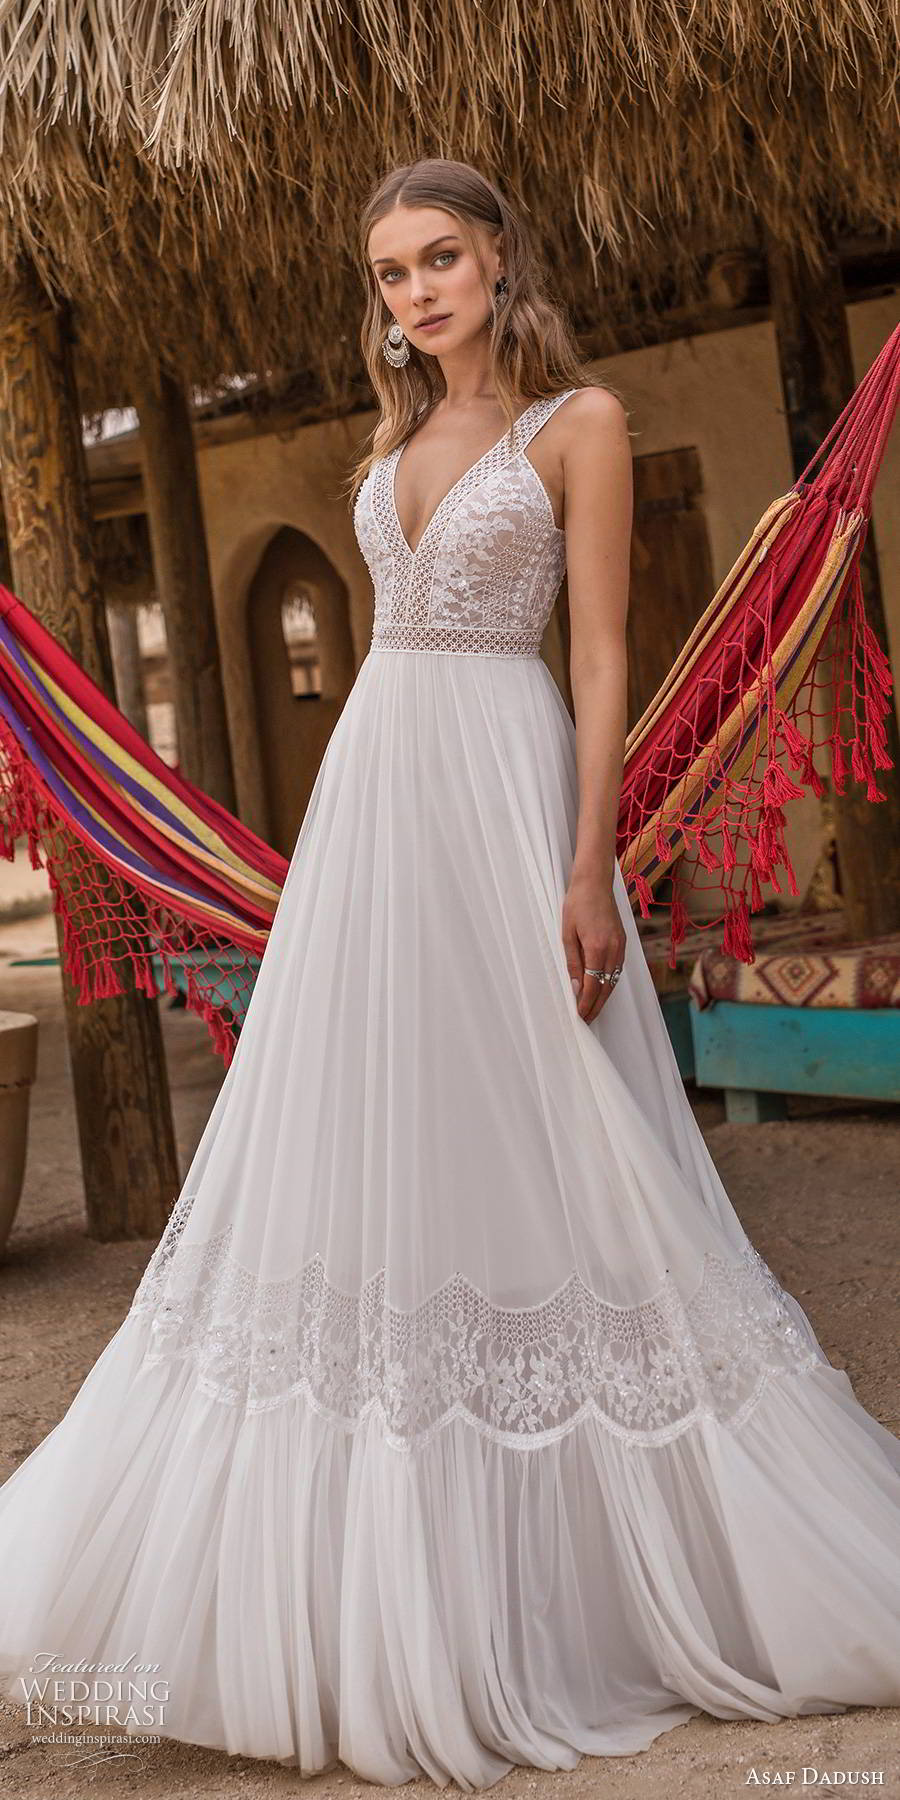 asaf dadush 2019 bridal sleeveless thick straps v neckline embellished bodice romantic a line ball gown wedding dress (3) mv